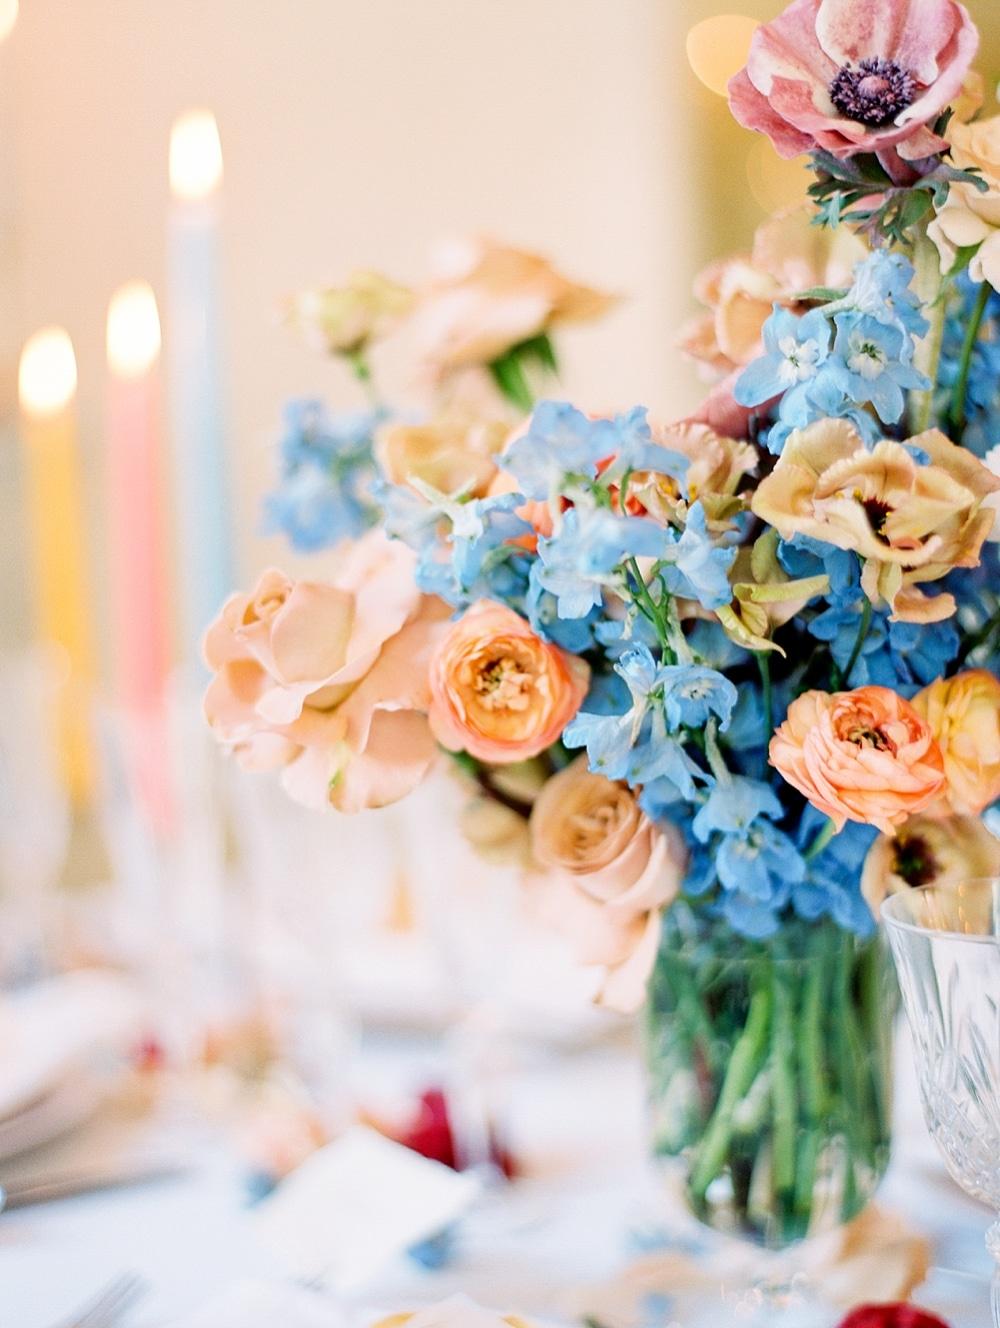 kristin-la-voie-photography-austin-wedding-photographer-woodbine-mansion-214